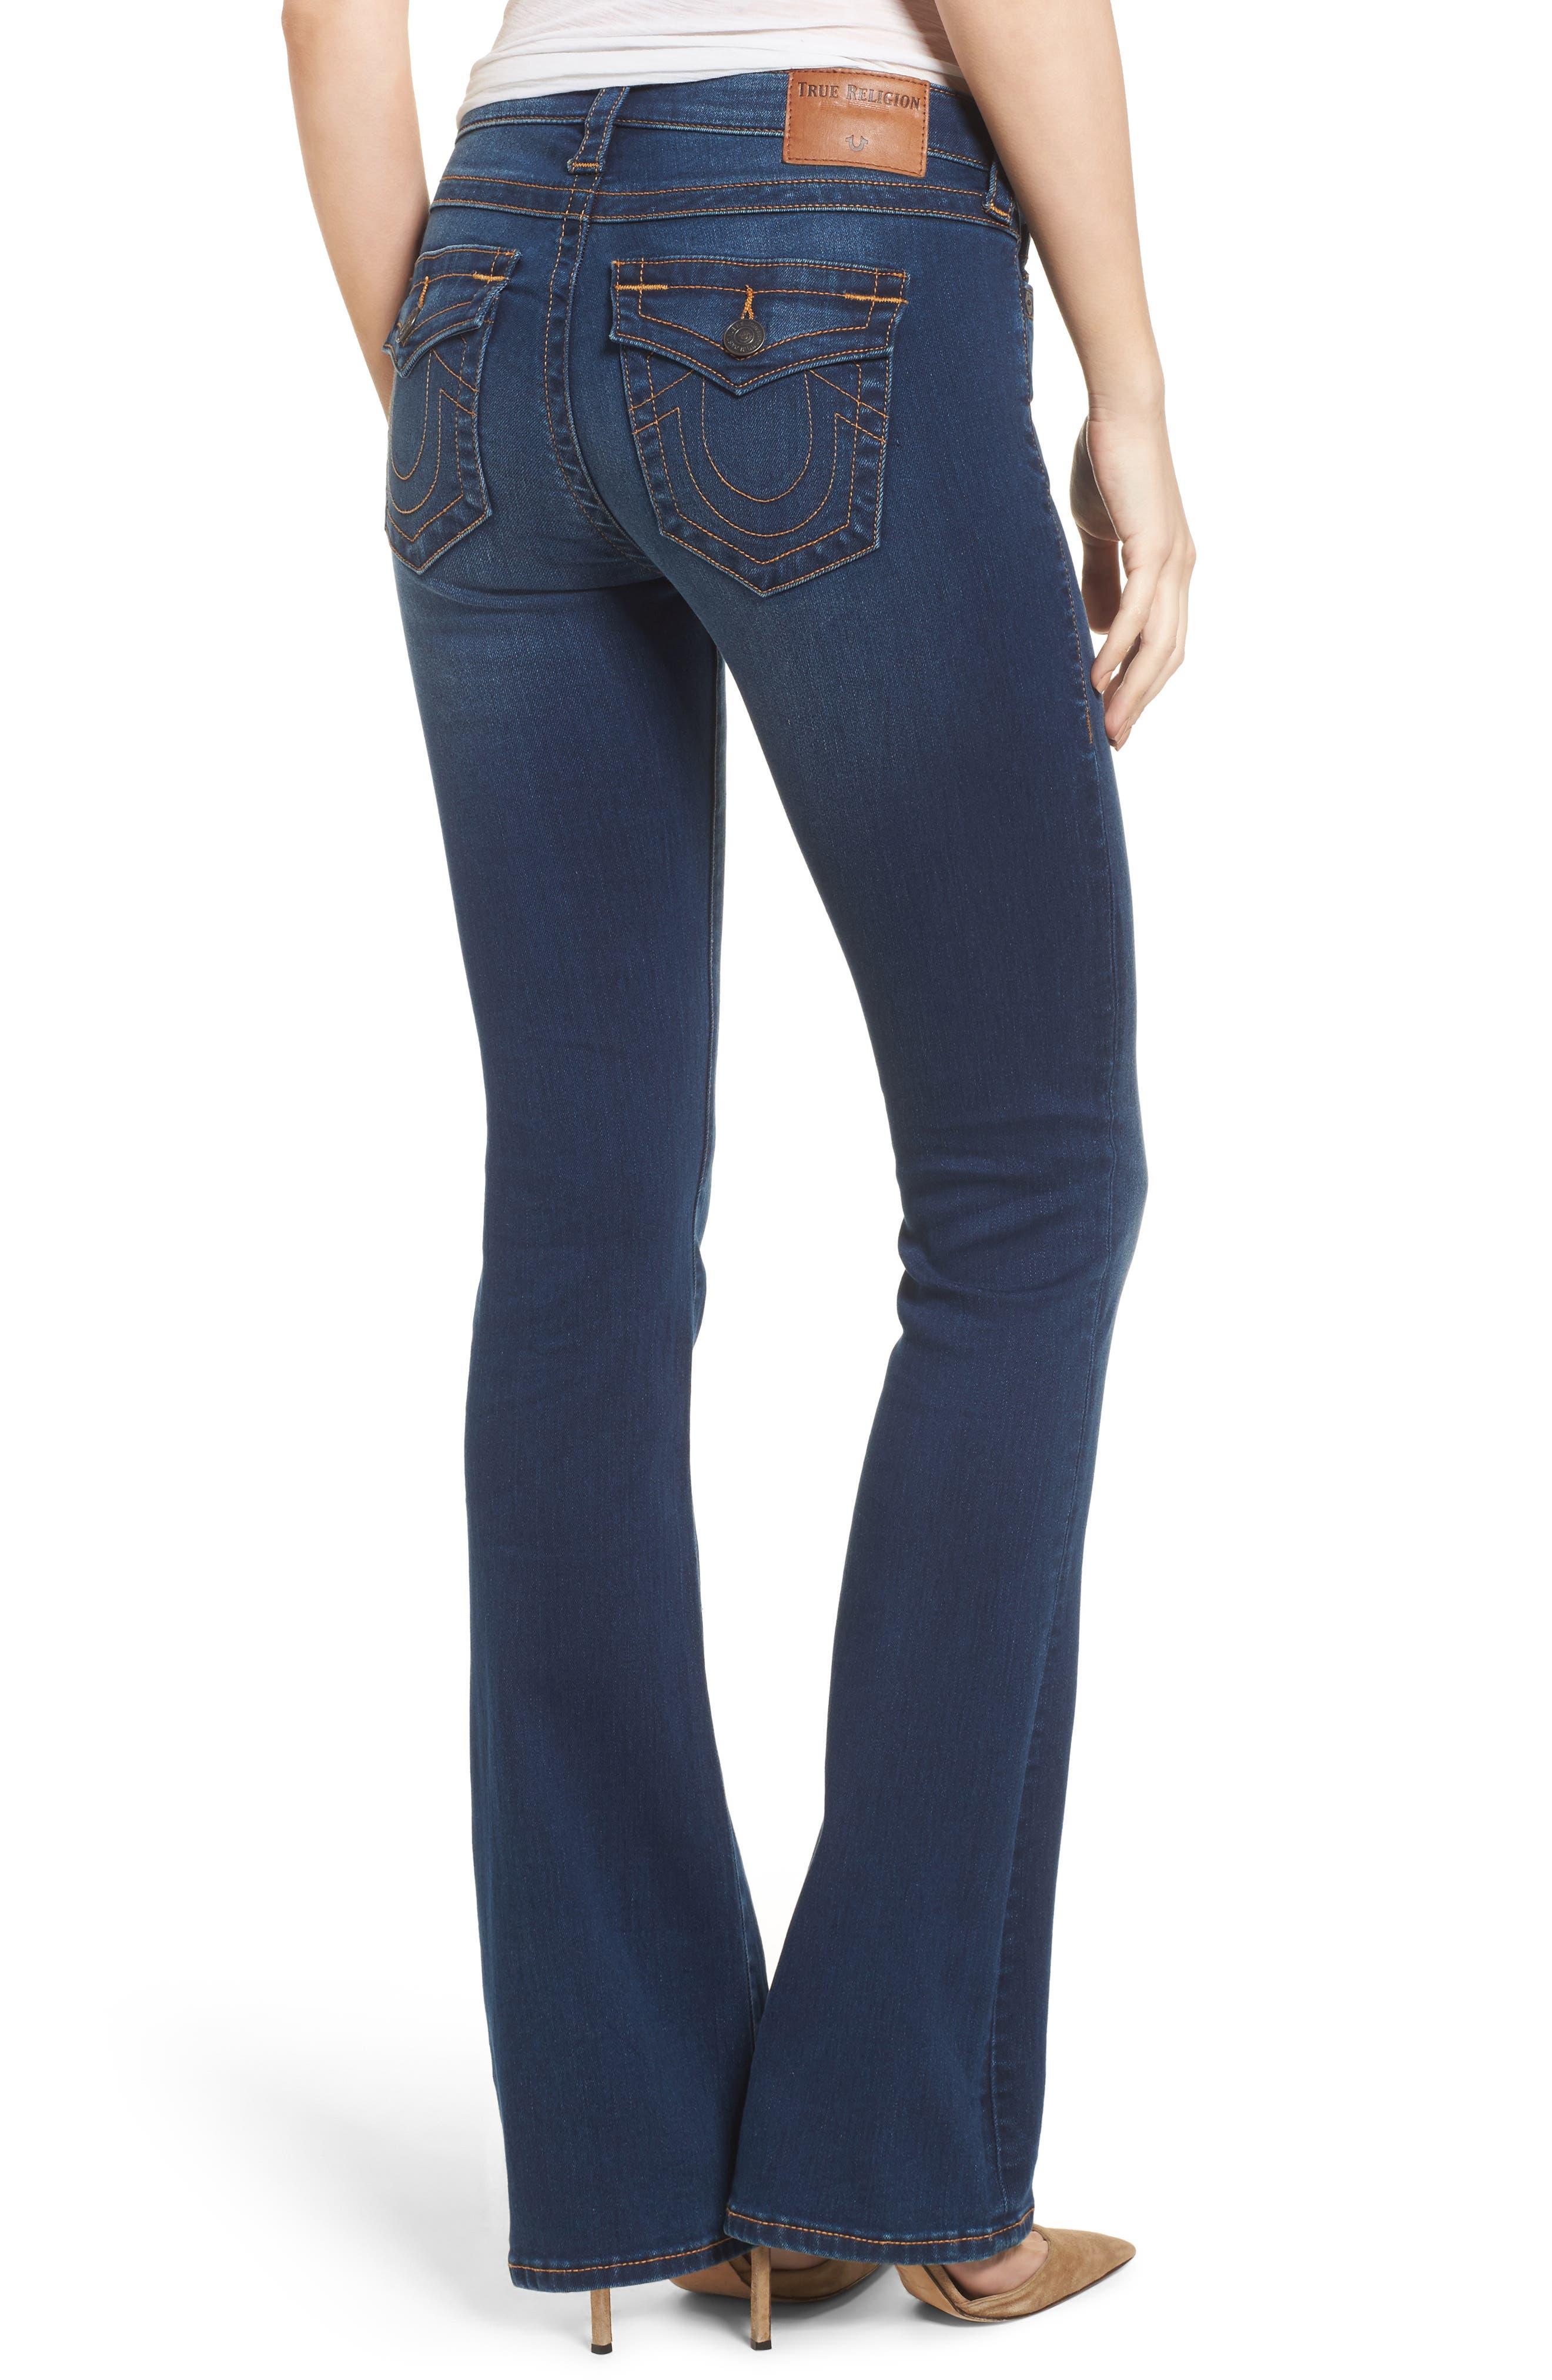 Becca Bootcut Jeans,                             Alternate thumbnail 2, color,                             Lands End Indigo